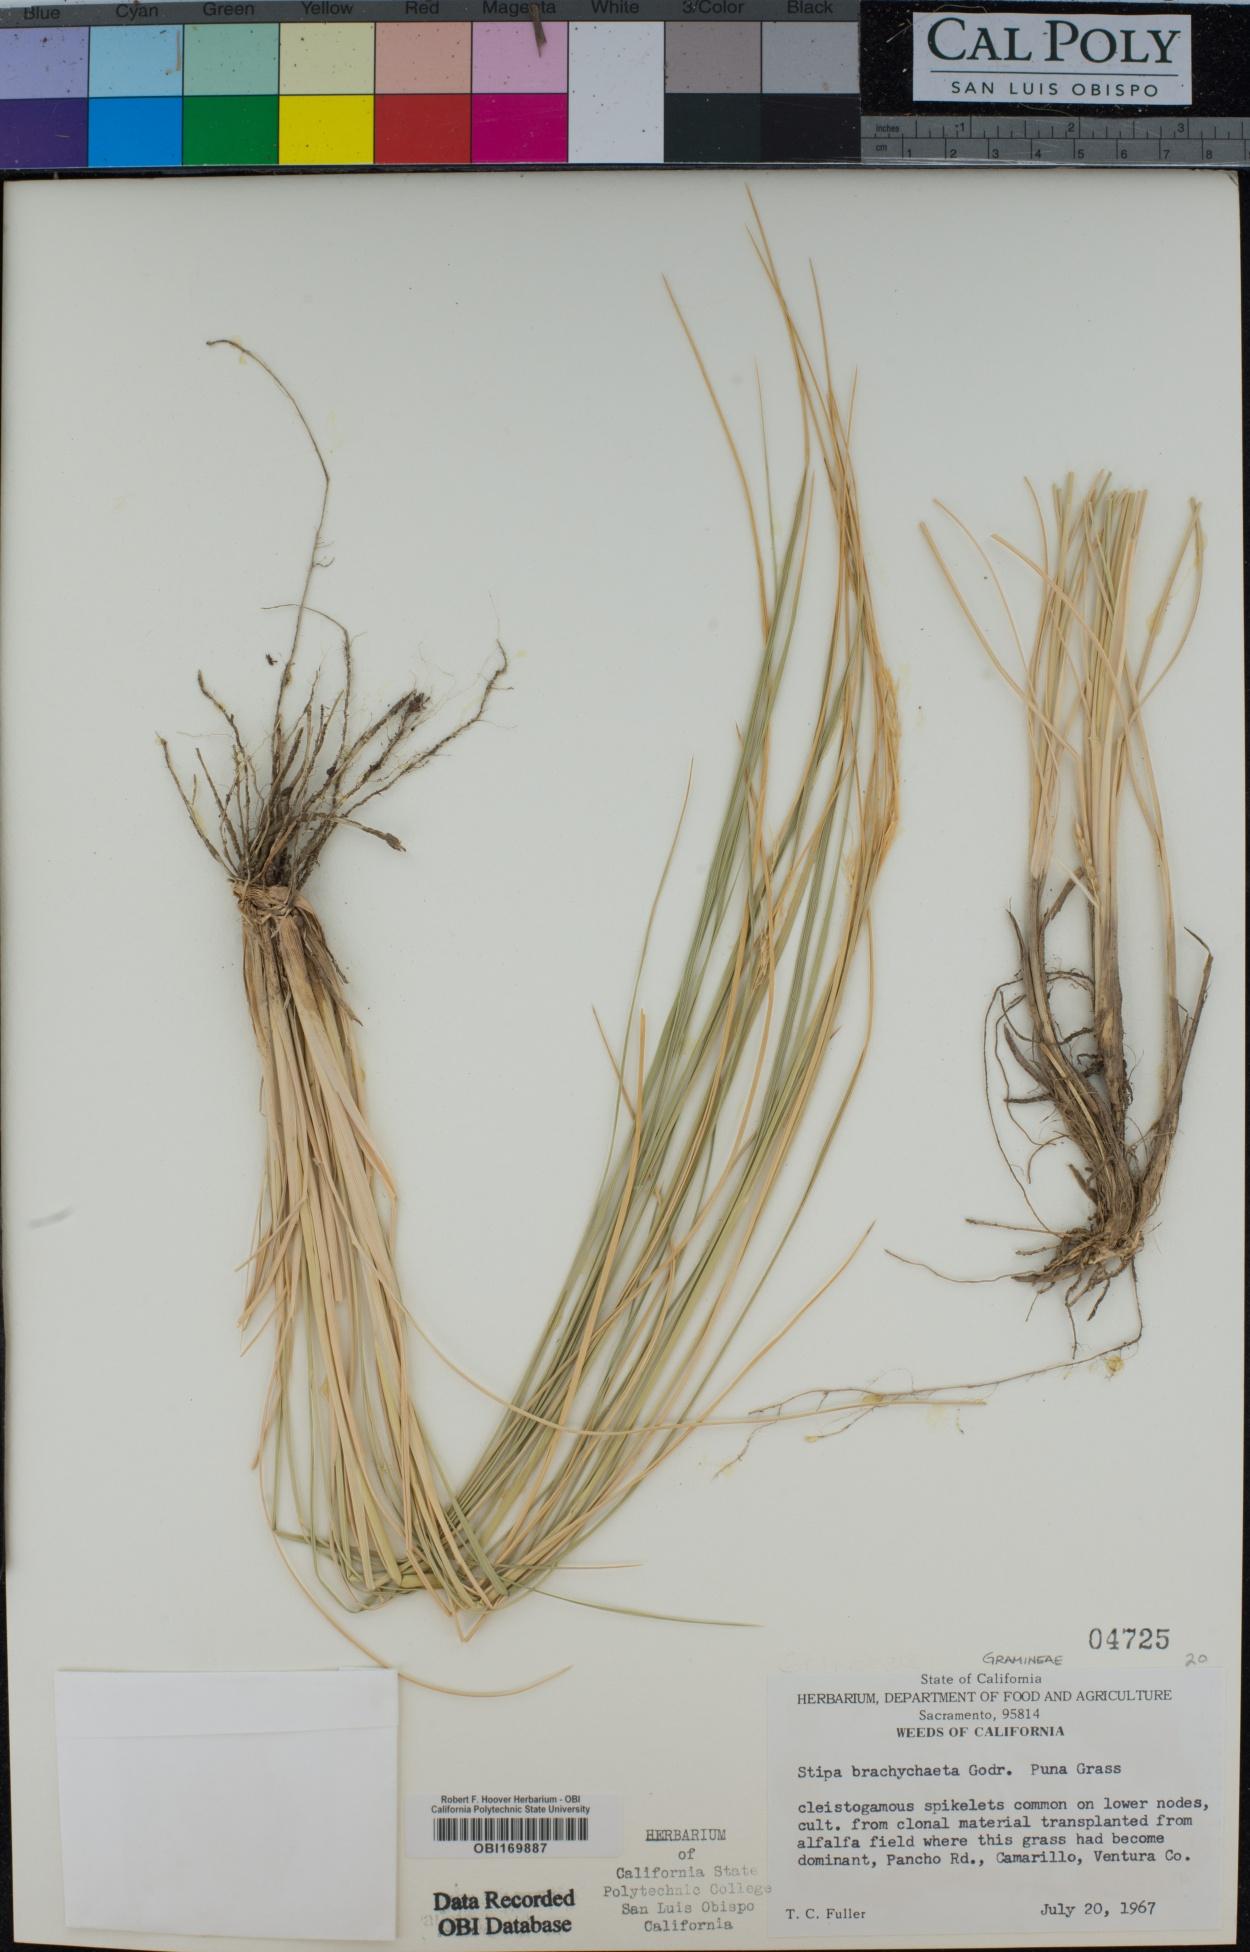 Stipa brachychaeta image